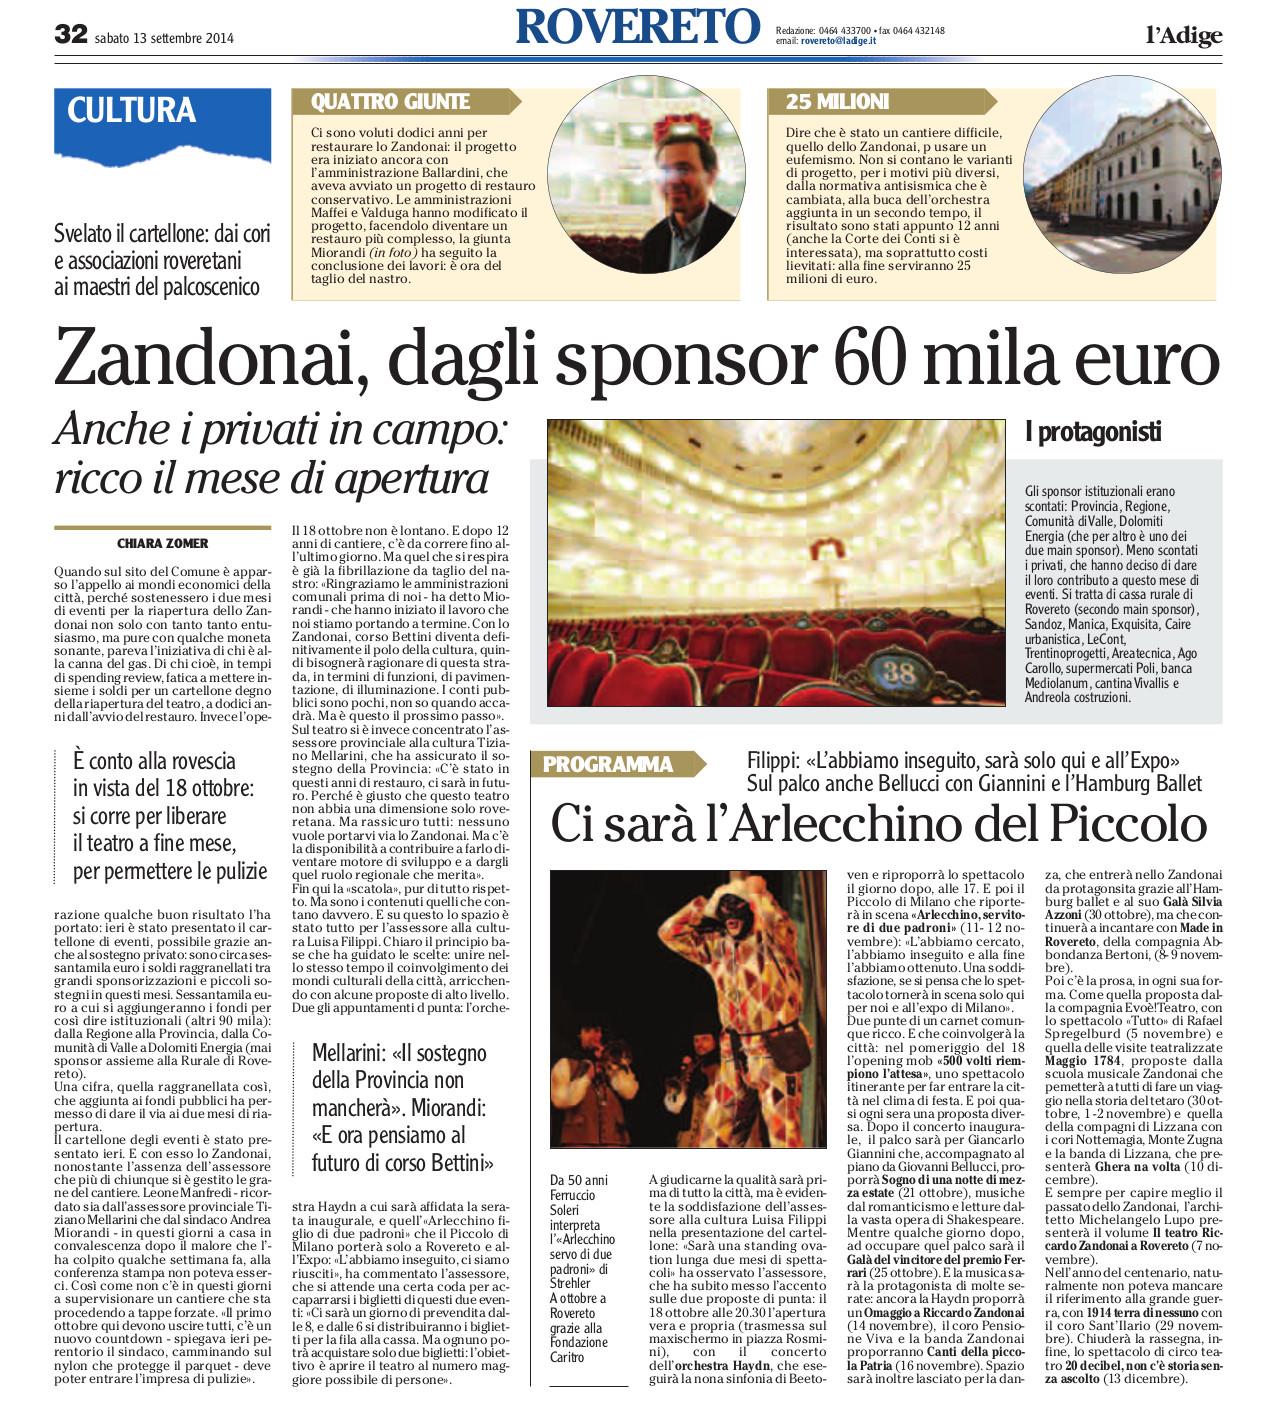 Fonte: l'Adige, 13/09/2014